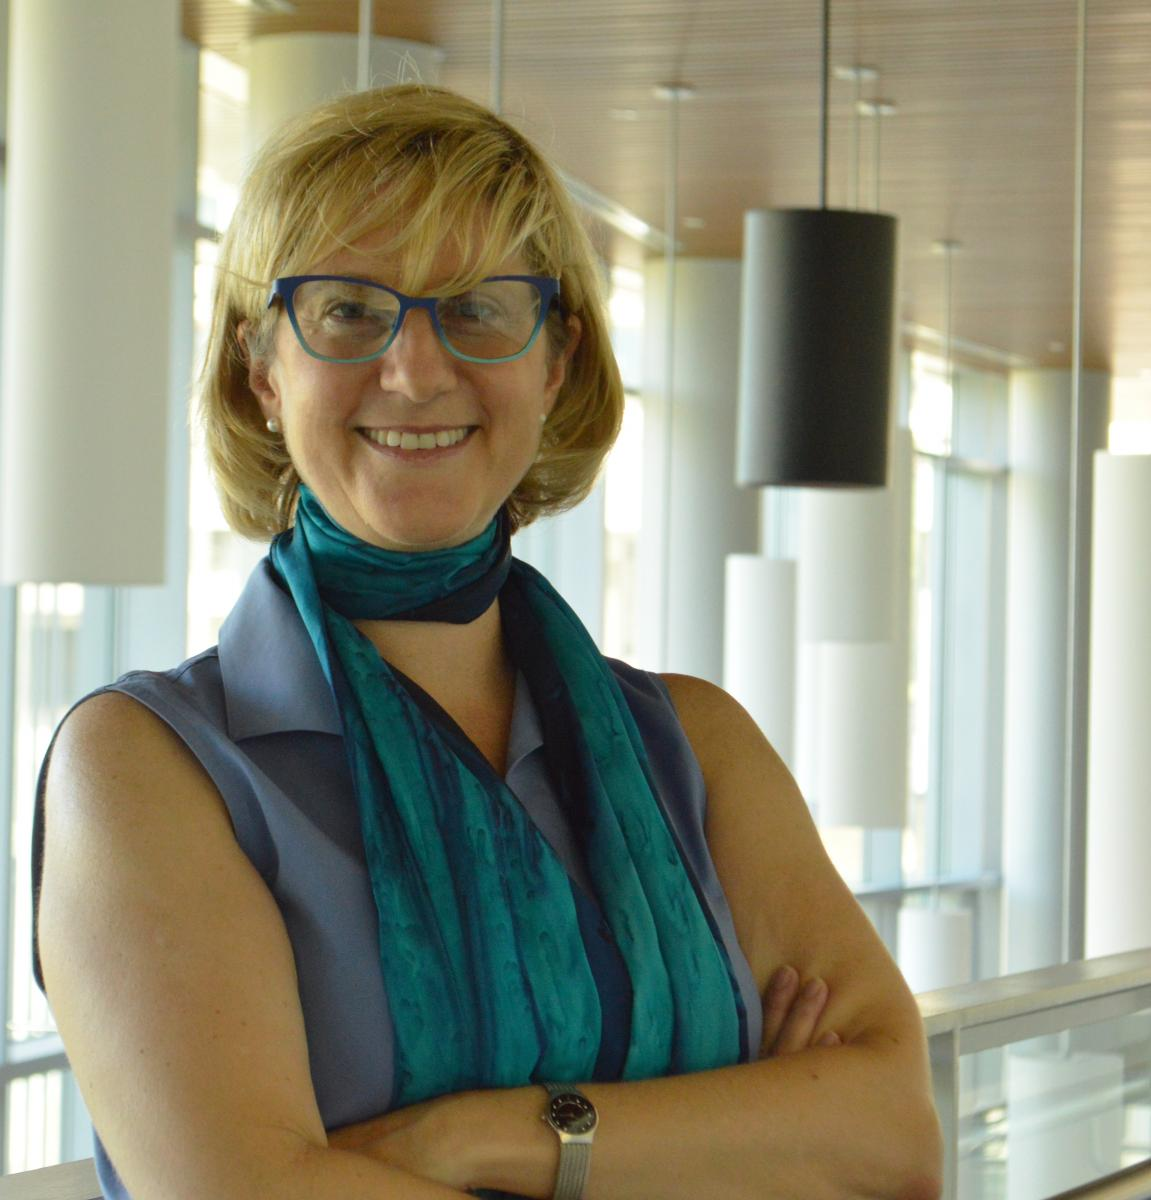 Laurel Smith-Doerr